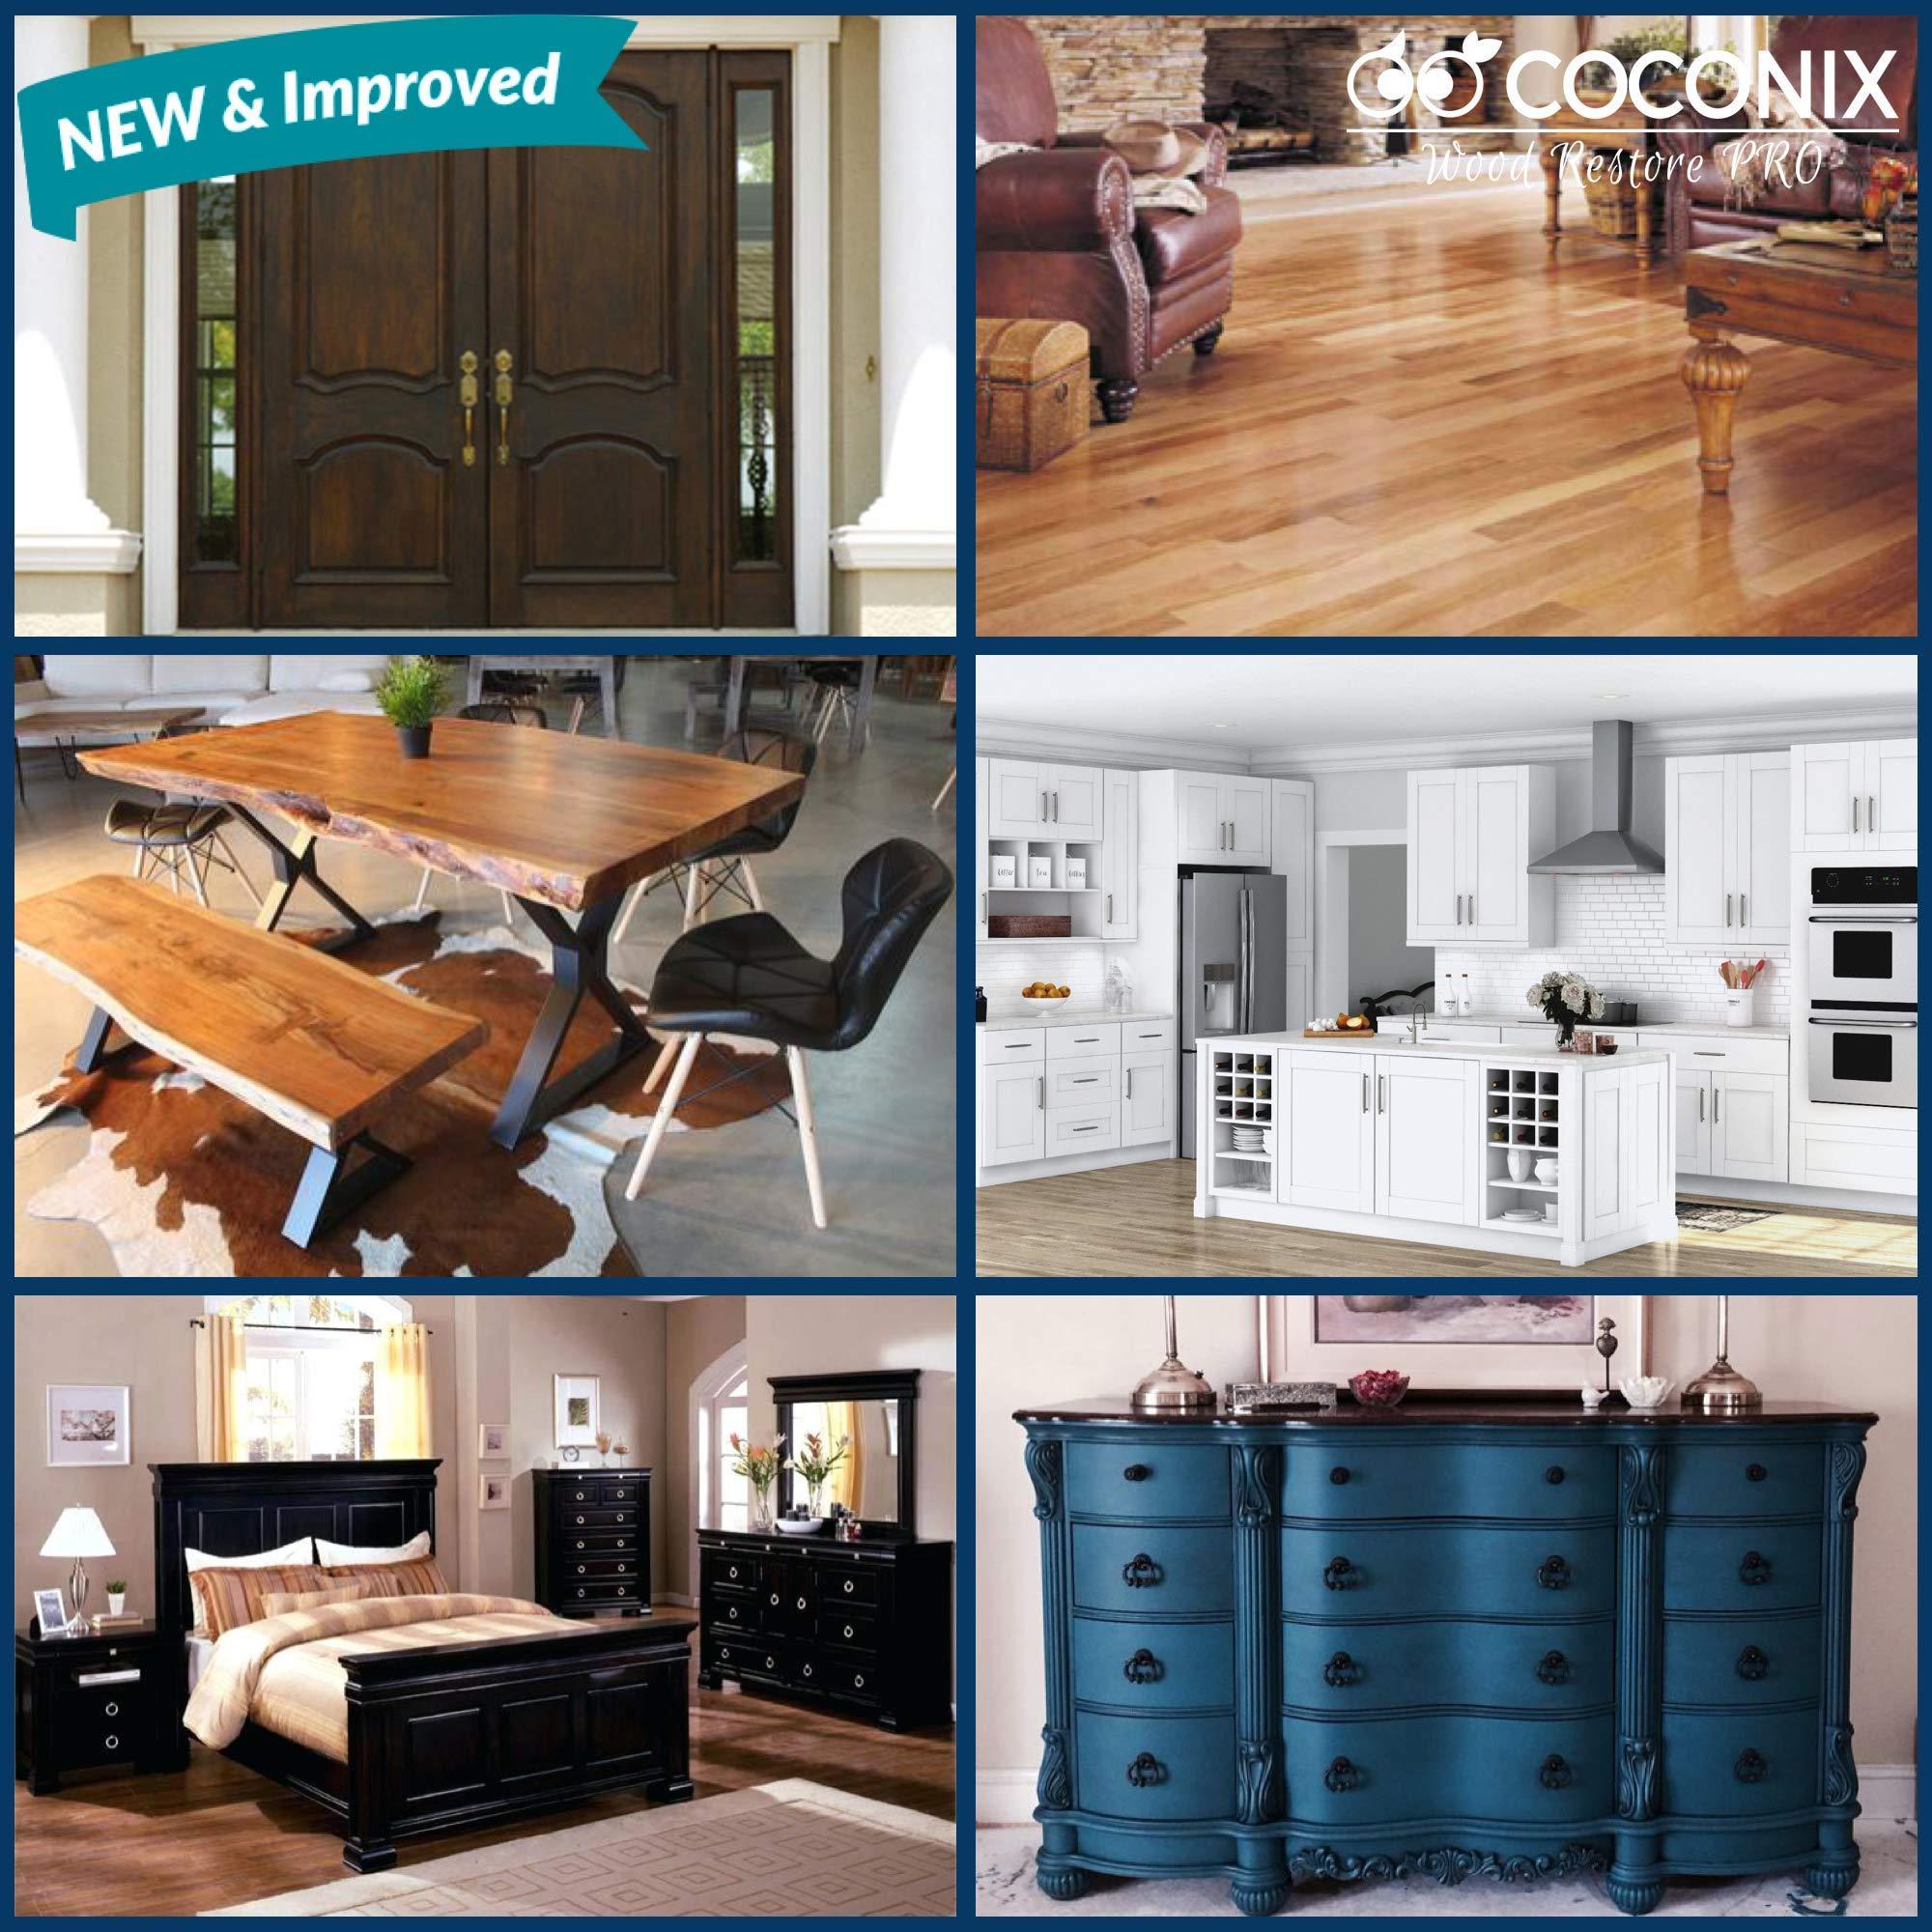 Coconix Wood Restore PRO - Professional Floor & Furniture Repair Kit by Coconix (Image #6)